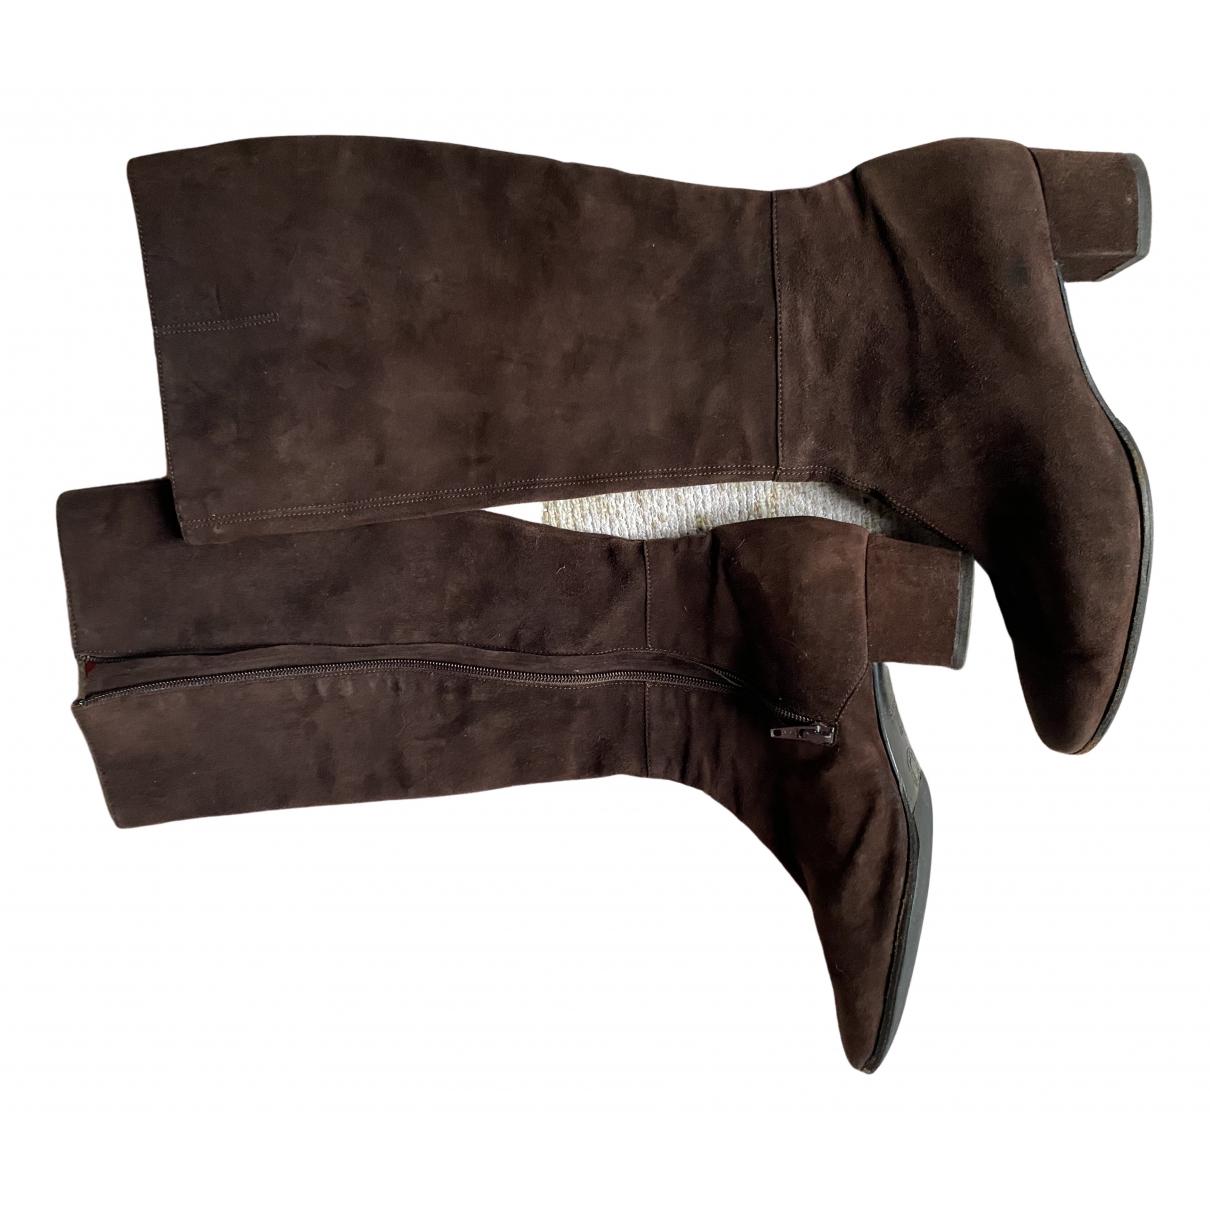 Celine N Brown Suede Boots for Women 39 EU